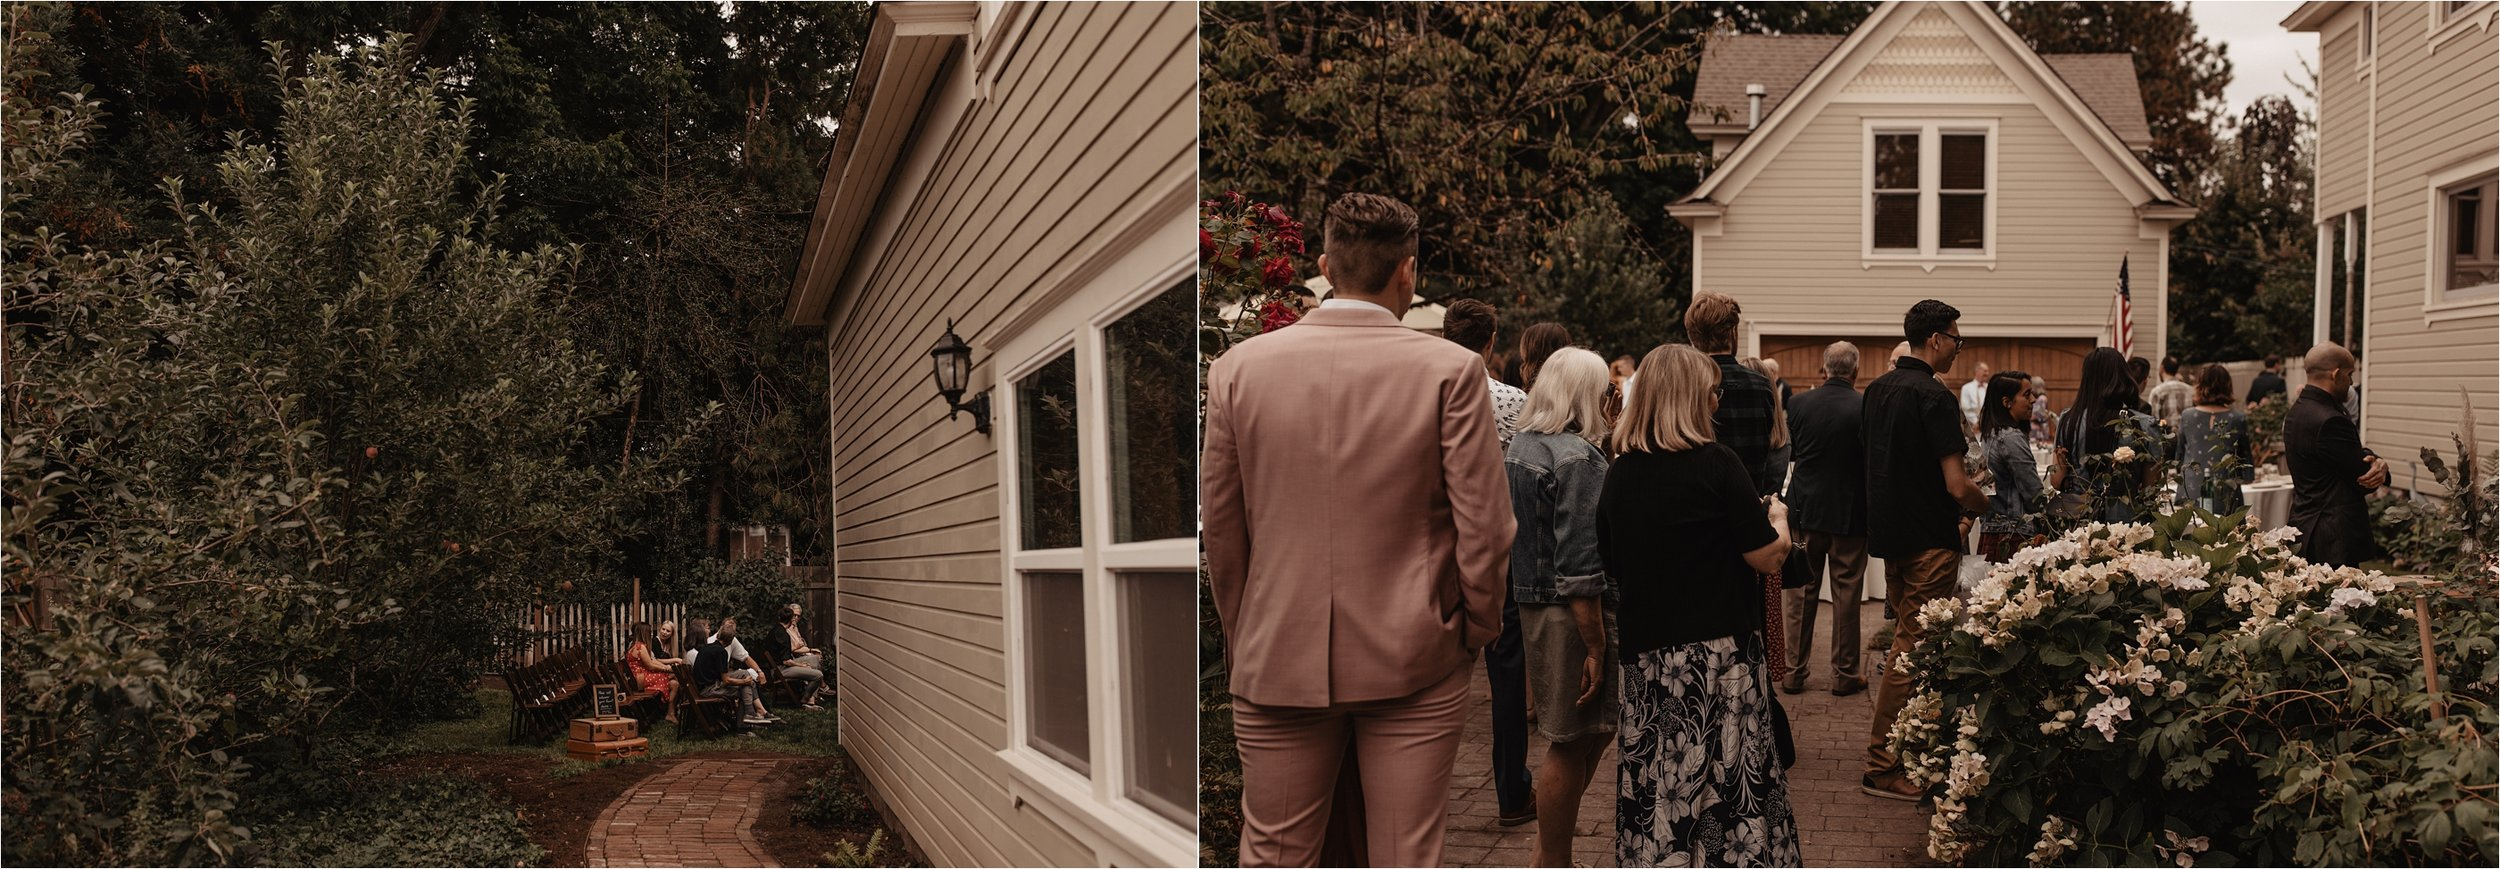 intimate-portland-modern-trendy-wedding_0070.jpg